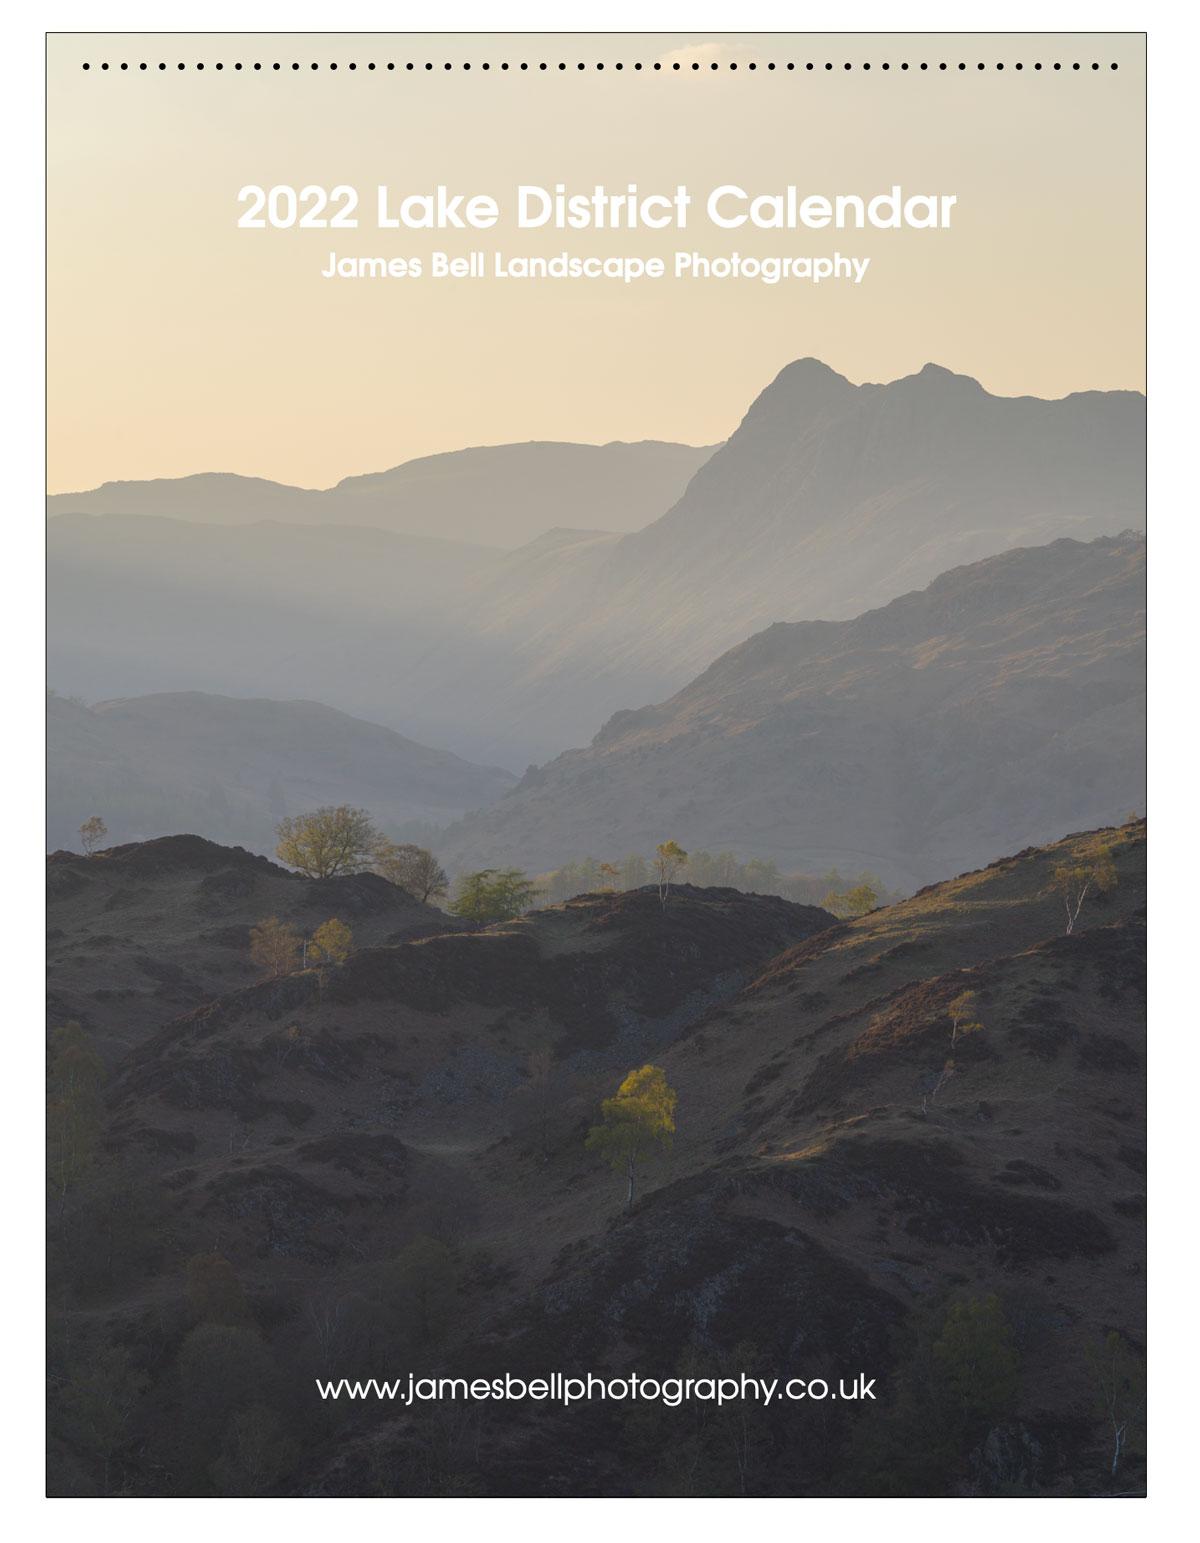 2022 Lake District Landscape Photography Calendar